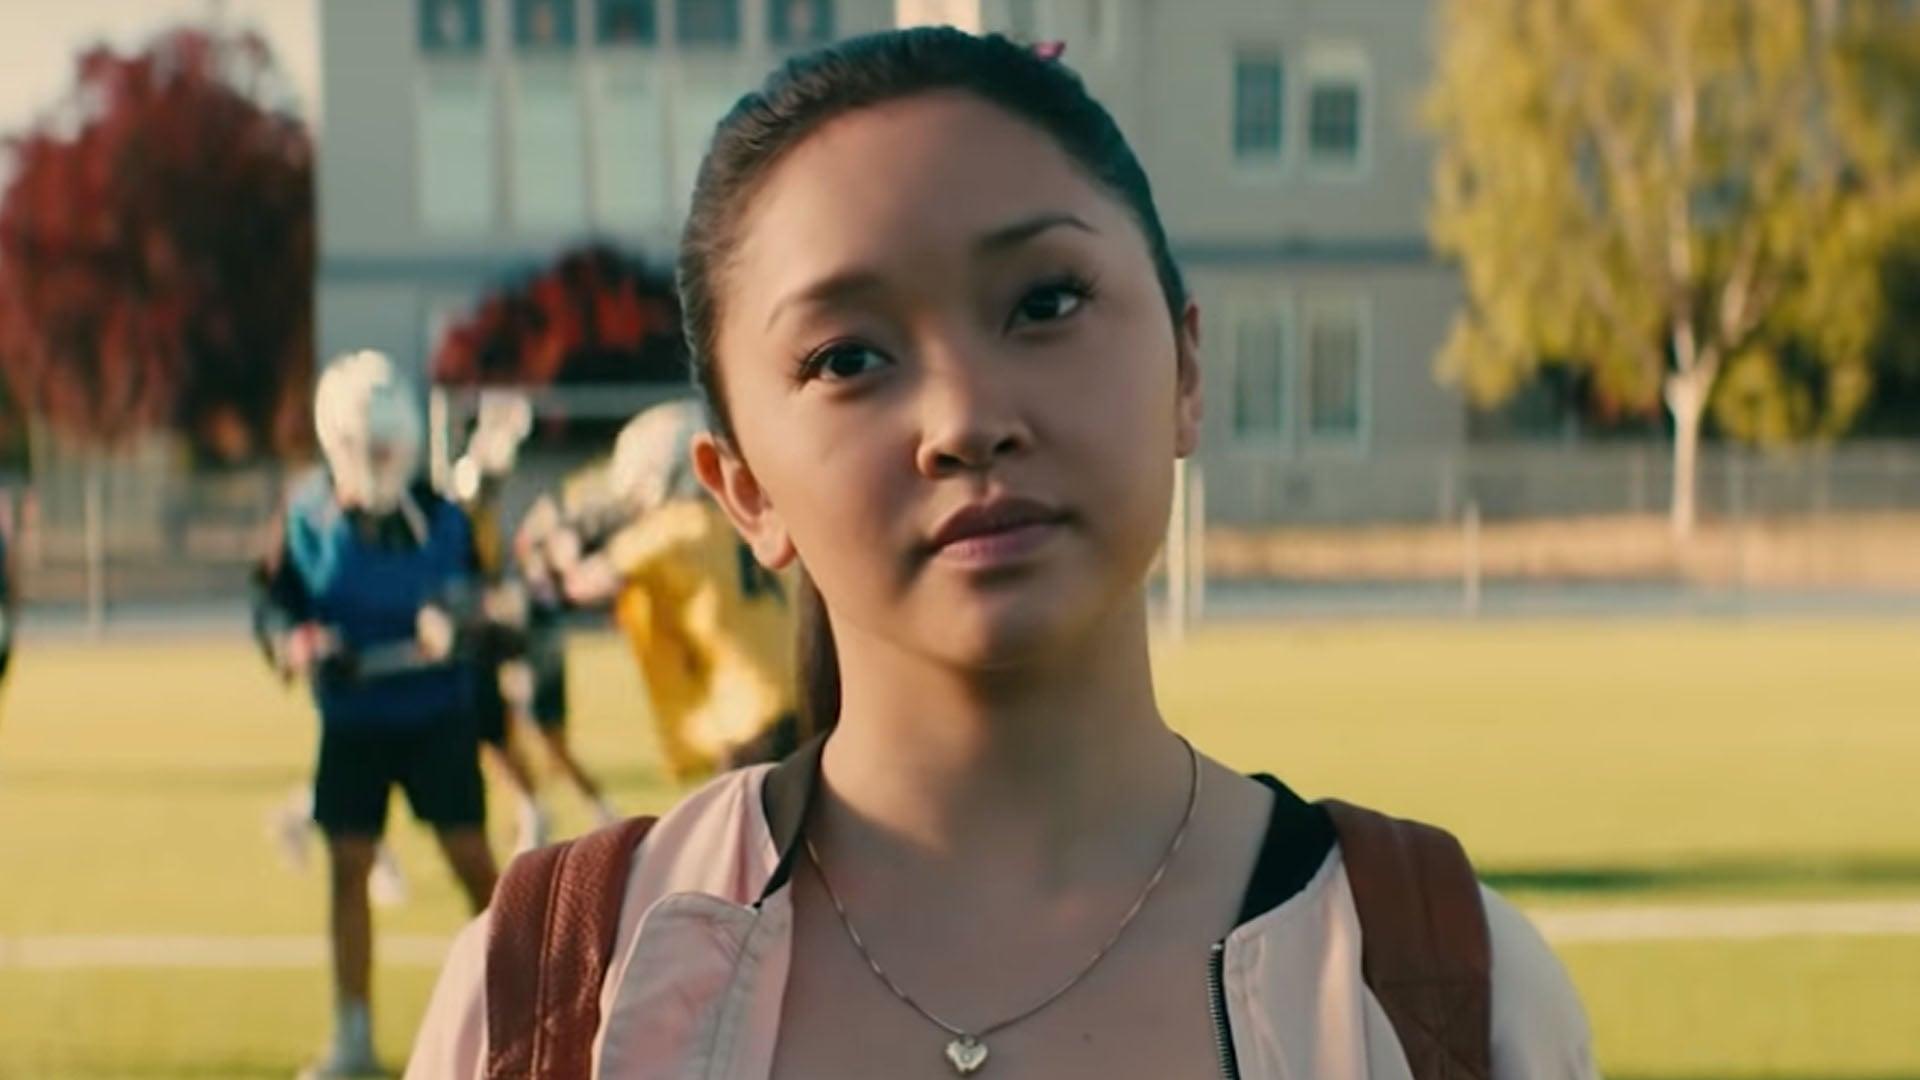 When Does P.S. I Still Love You Premiere on Netflix? | POPSUGAR Entertainment UK